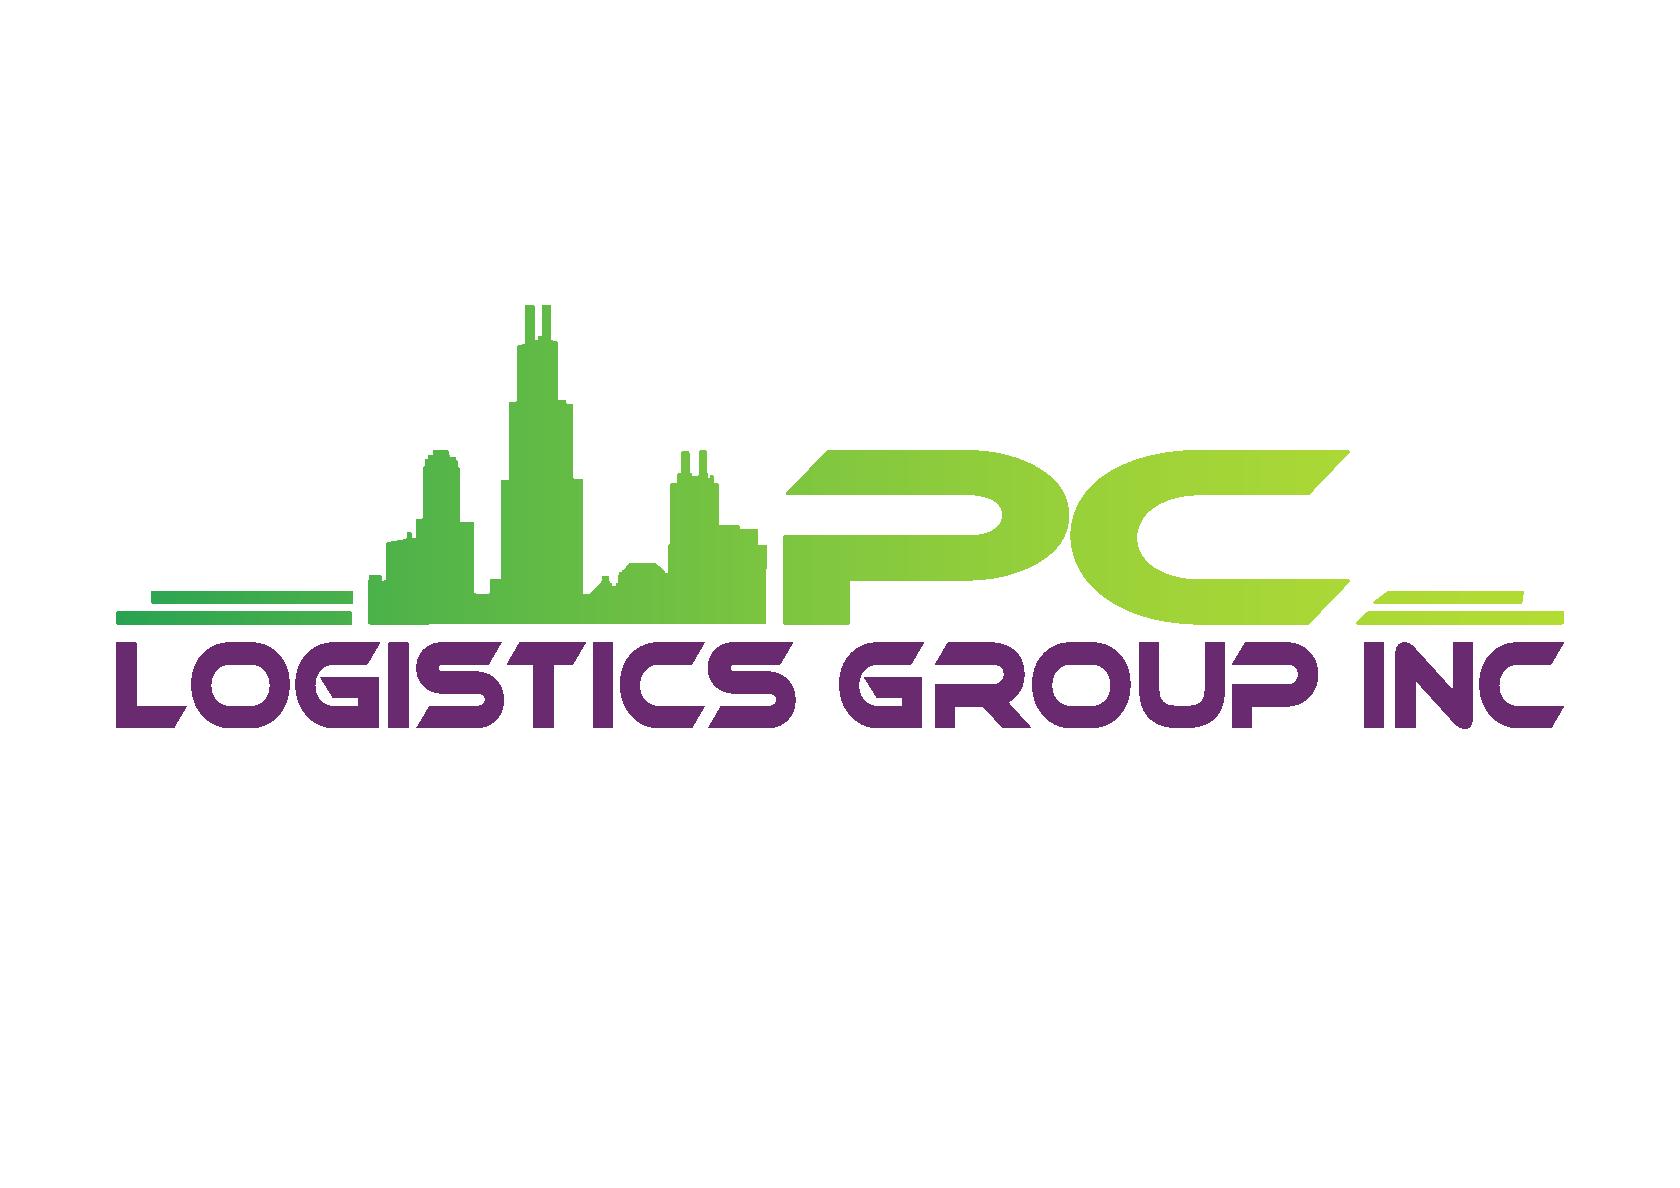 PC Logistics Group Inc